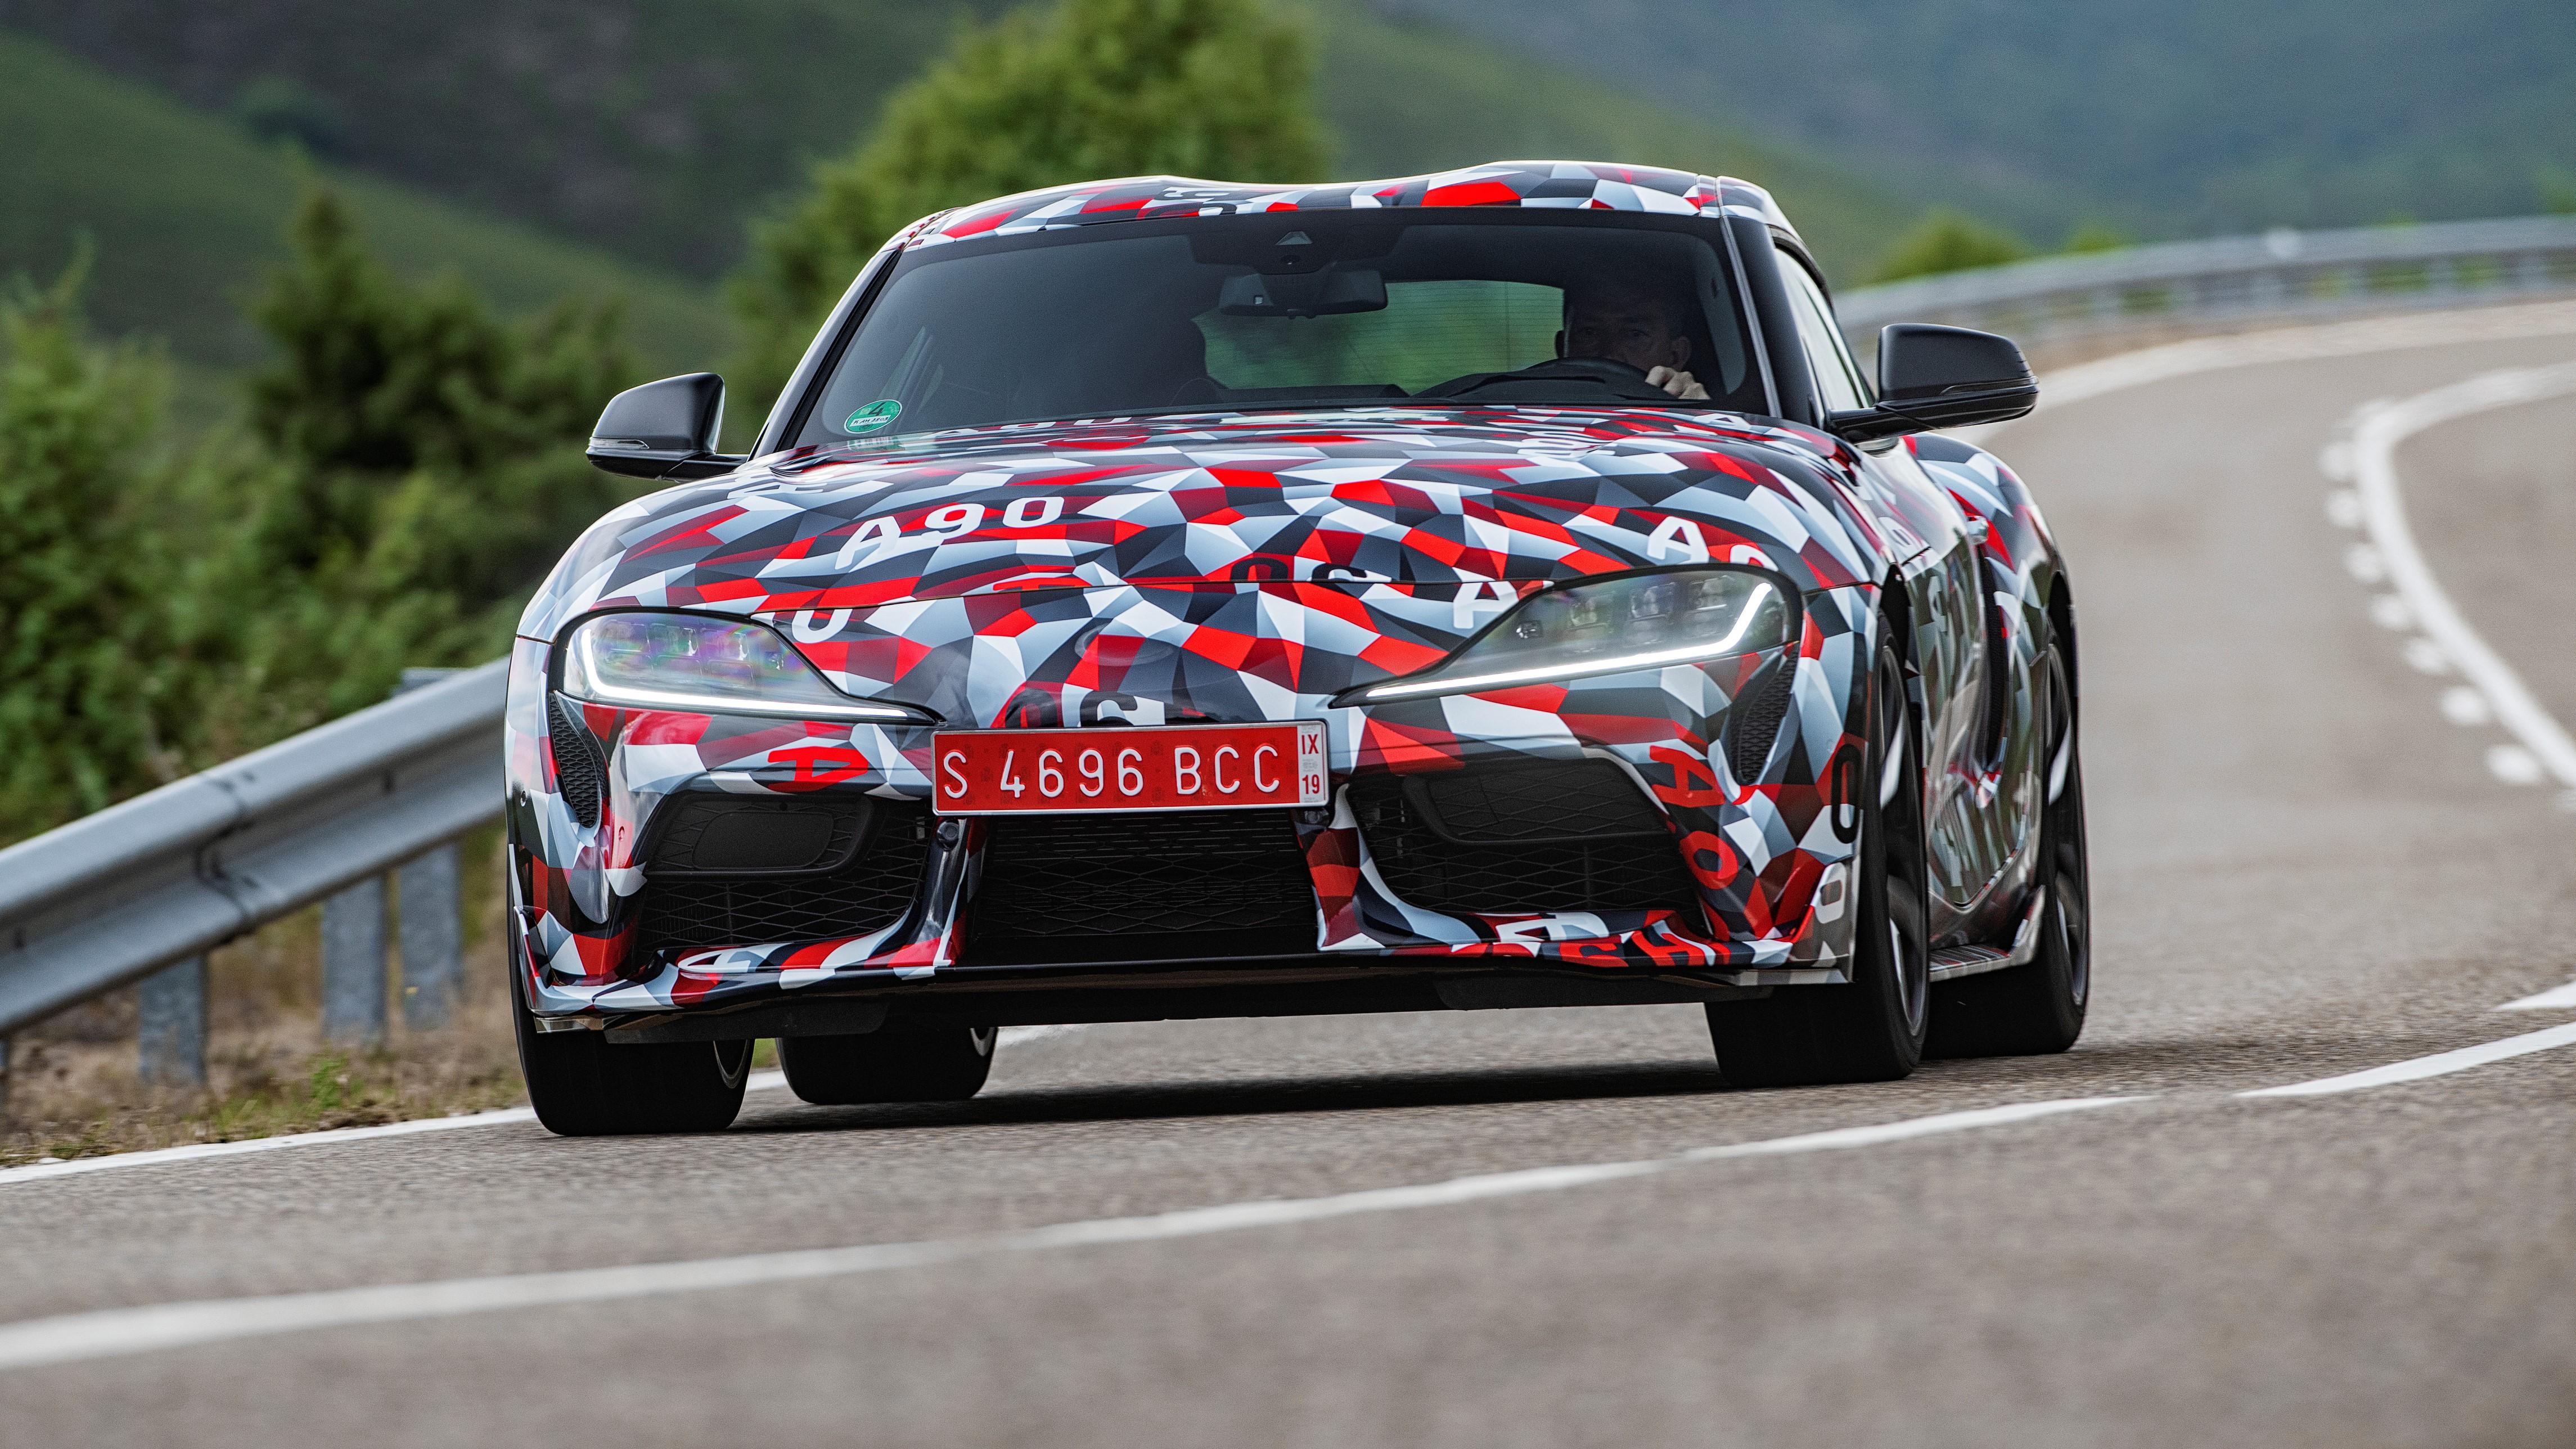 Toyota Supra to lead new performance era